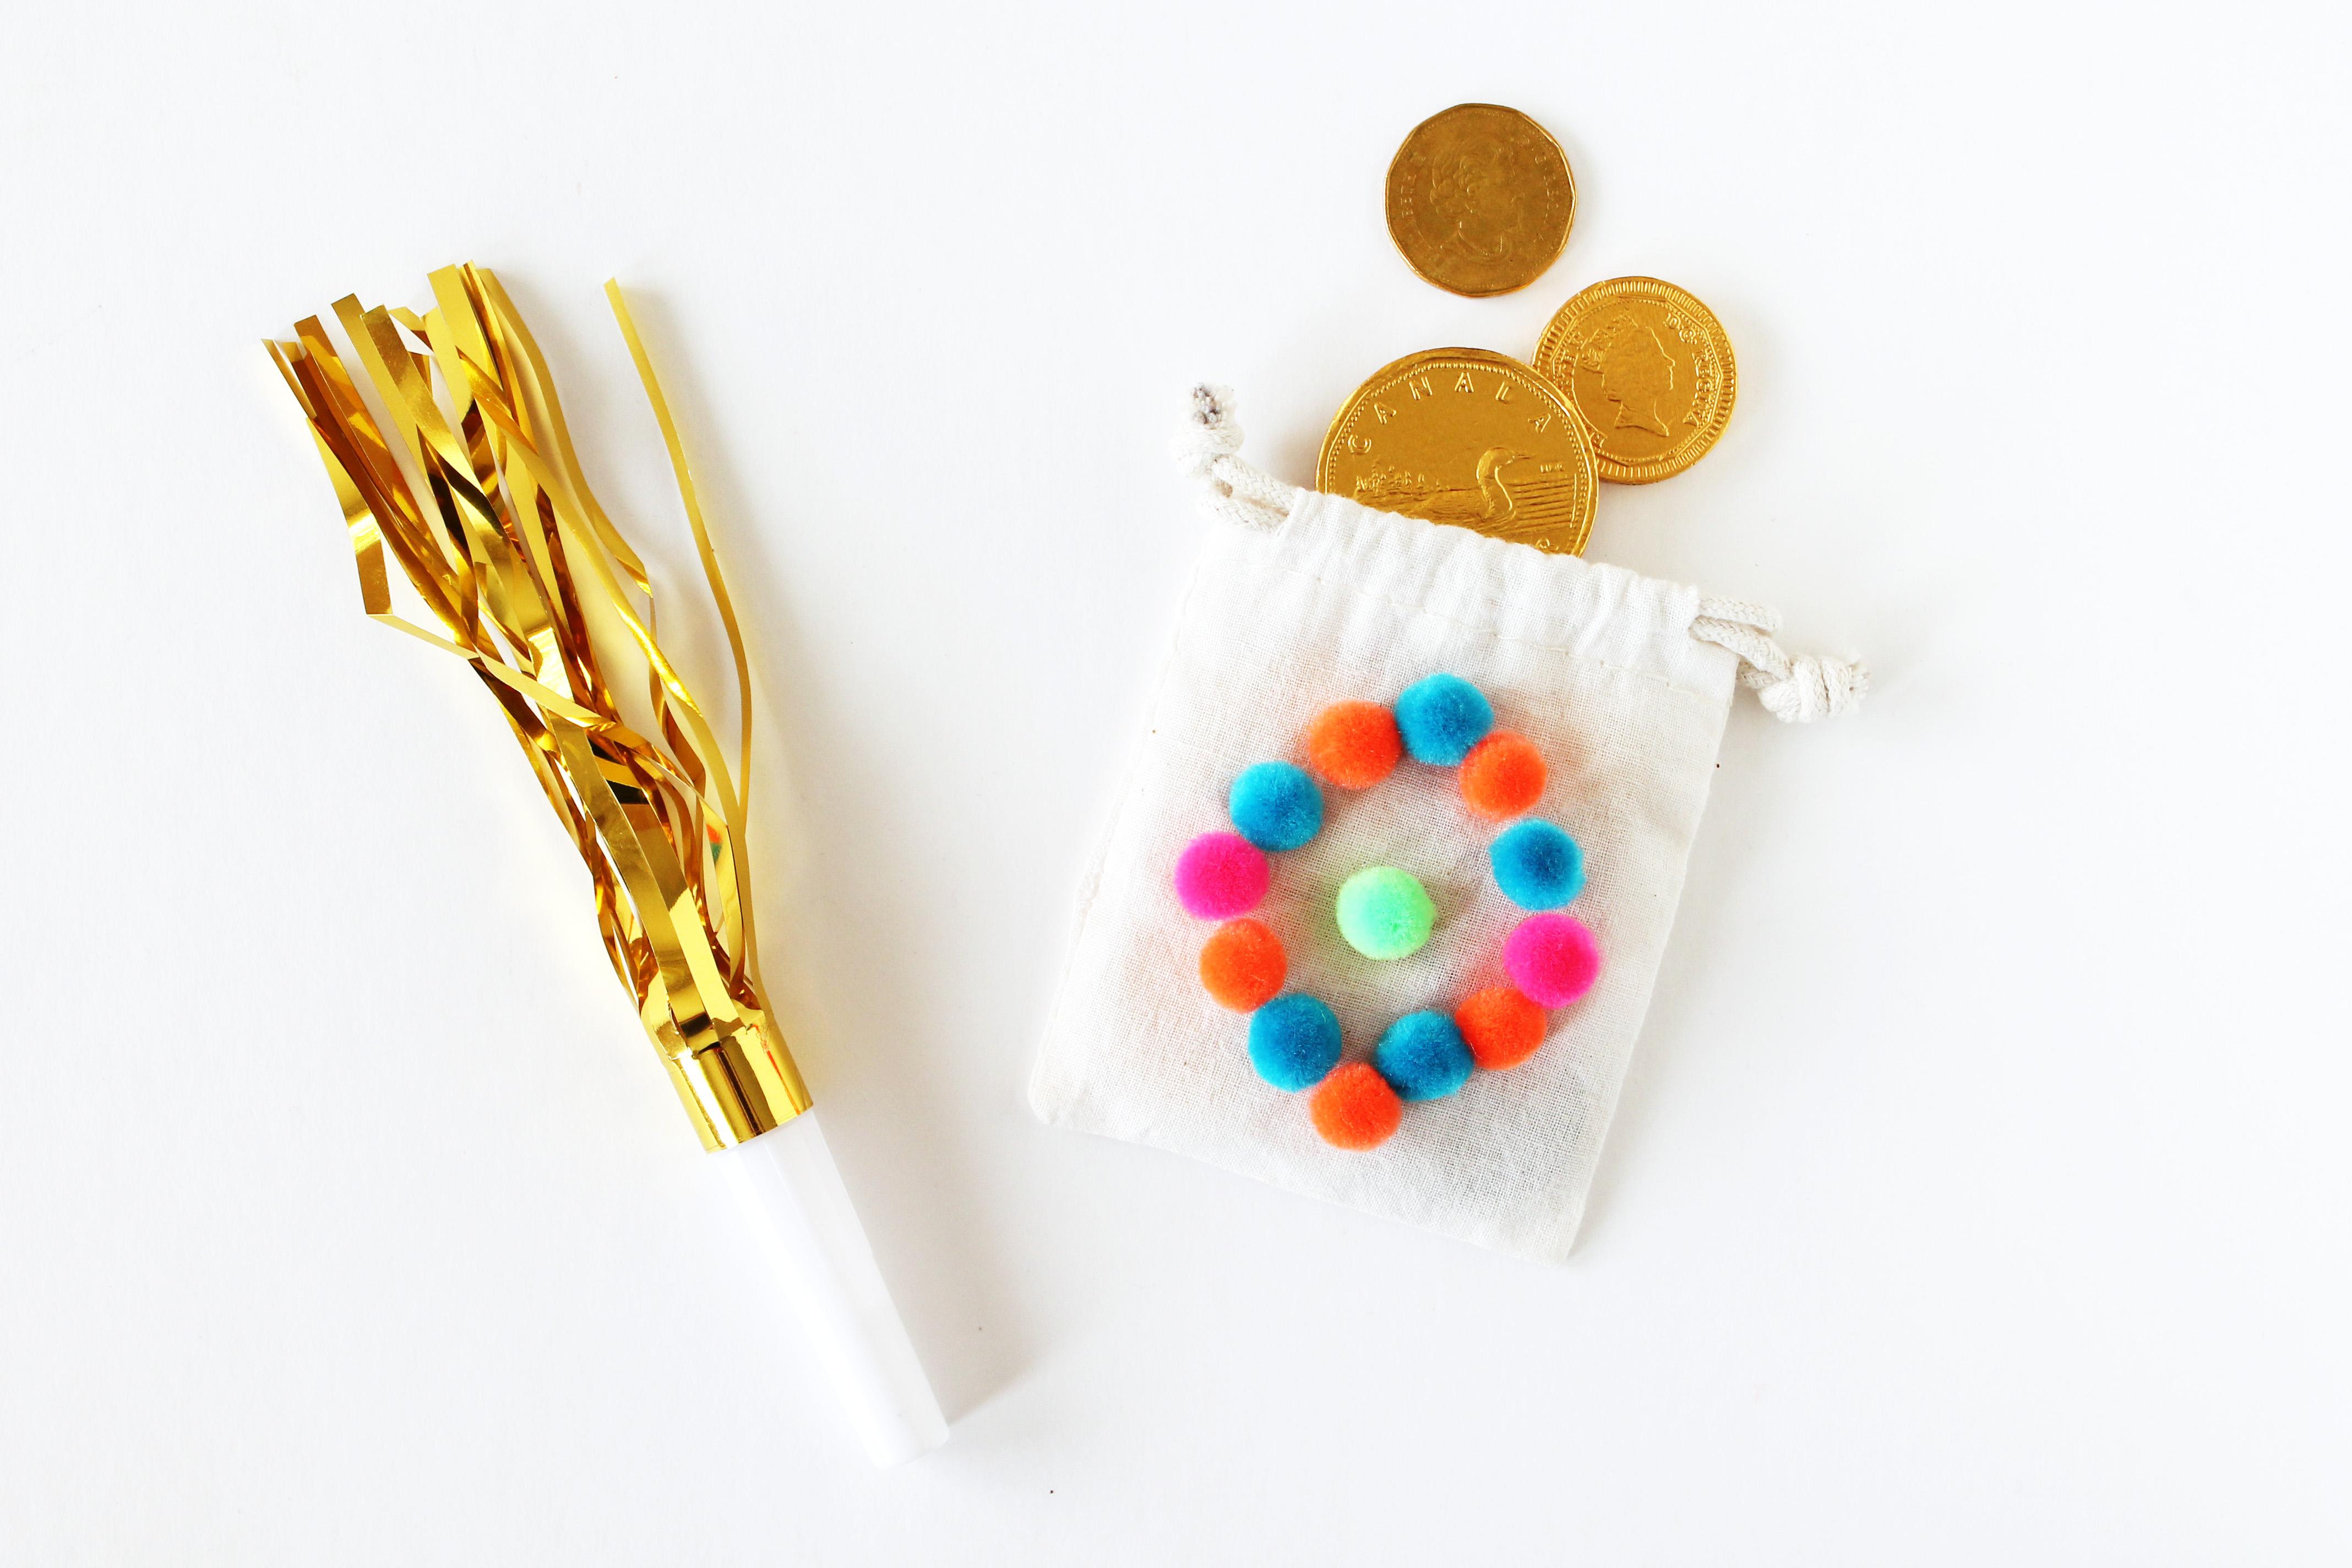 pompom-eid-decorations-money-bags